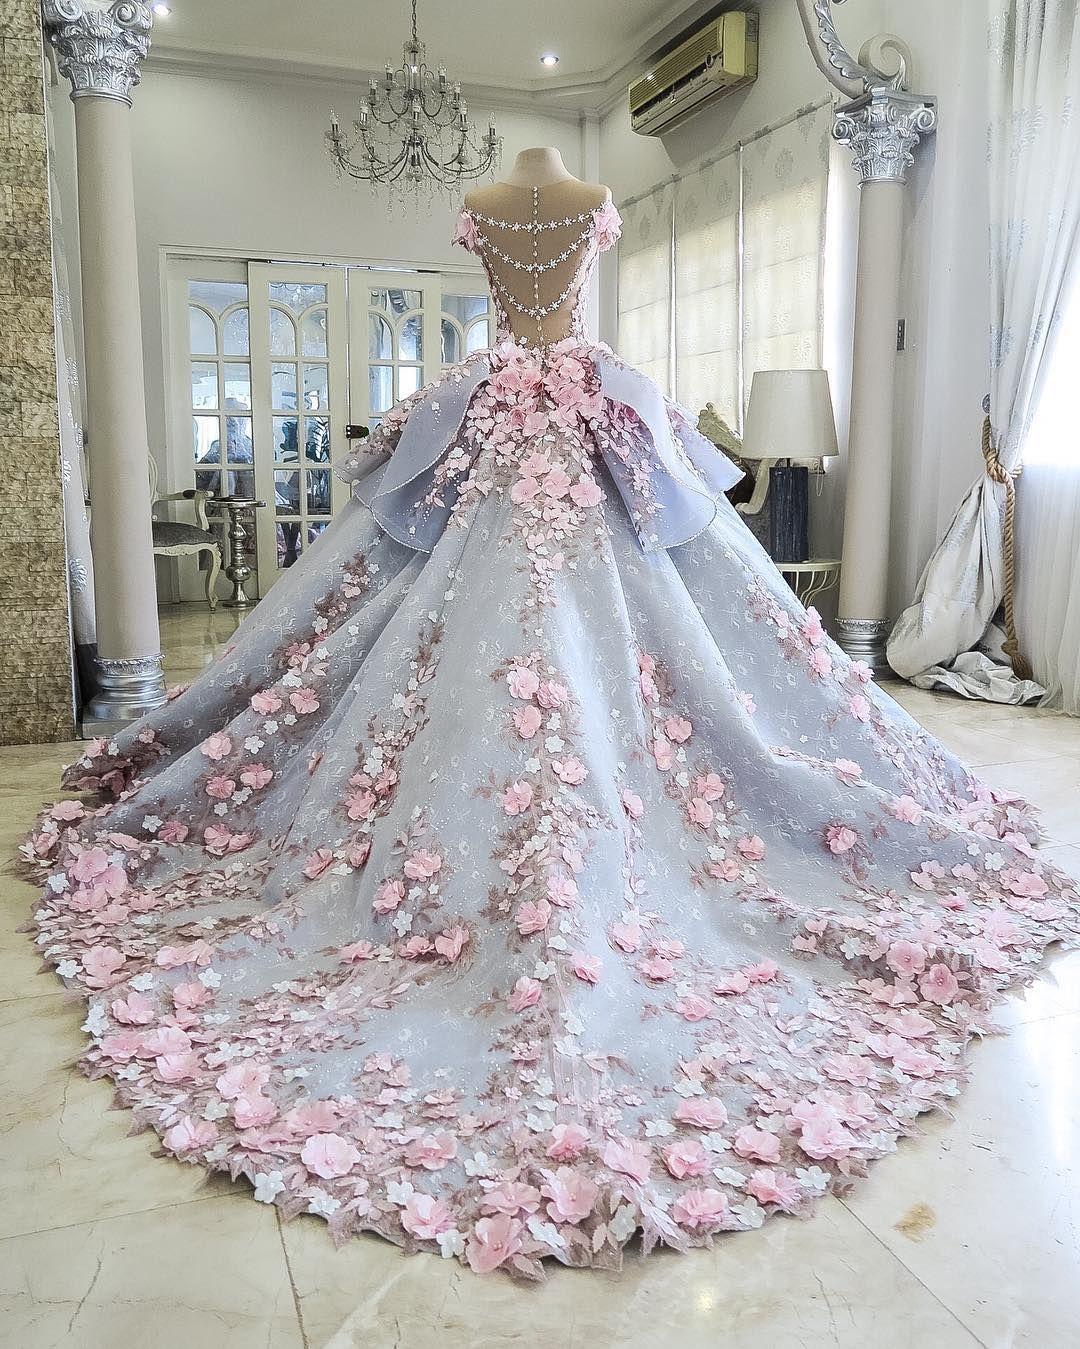 Angela (Via 3.0) #debut #maktumang #fashion #design #love #dress ...